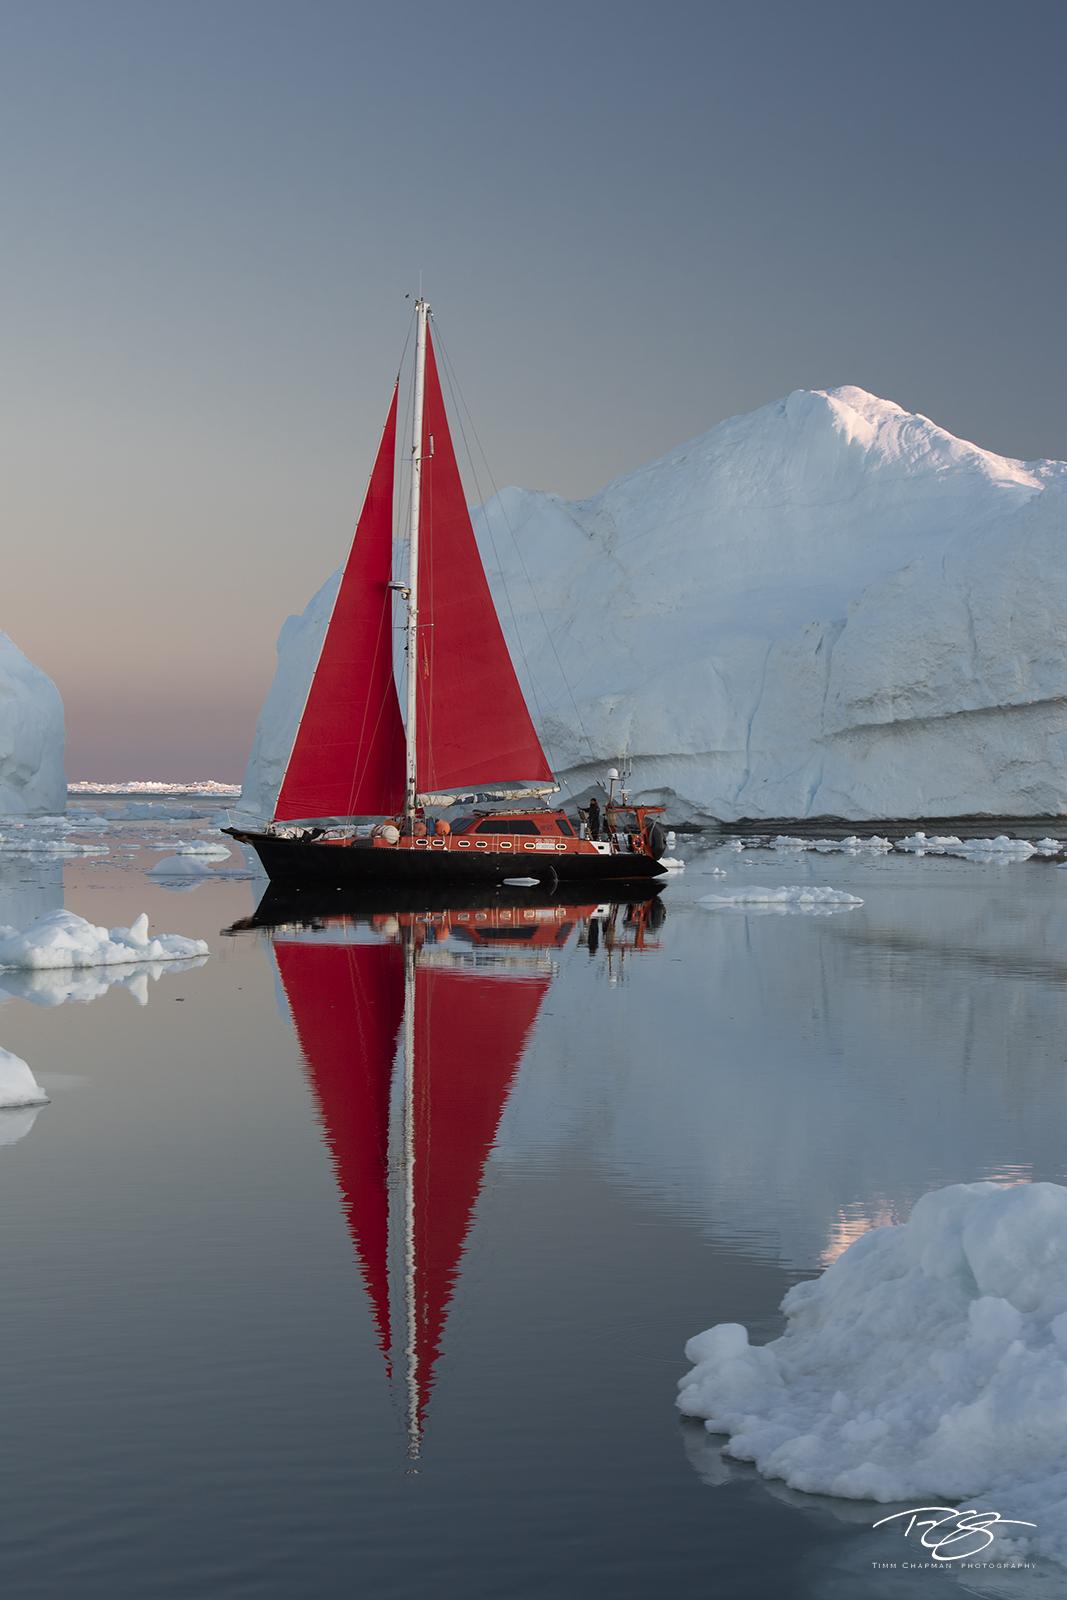 reflection; golden light; golden hour; pastel sky; scarlet sails, ship; sailboat; sailing; red sails; schooner, ice; iceberg; disko bay; dawn; sunrise; early morning, yacht, photo